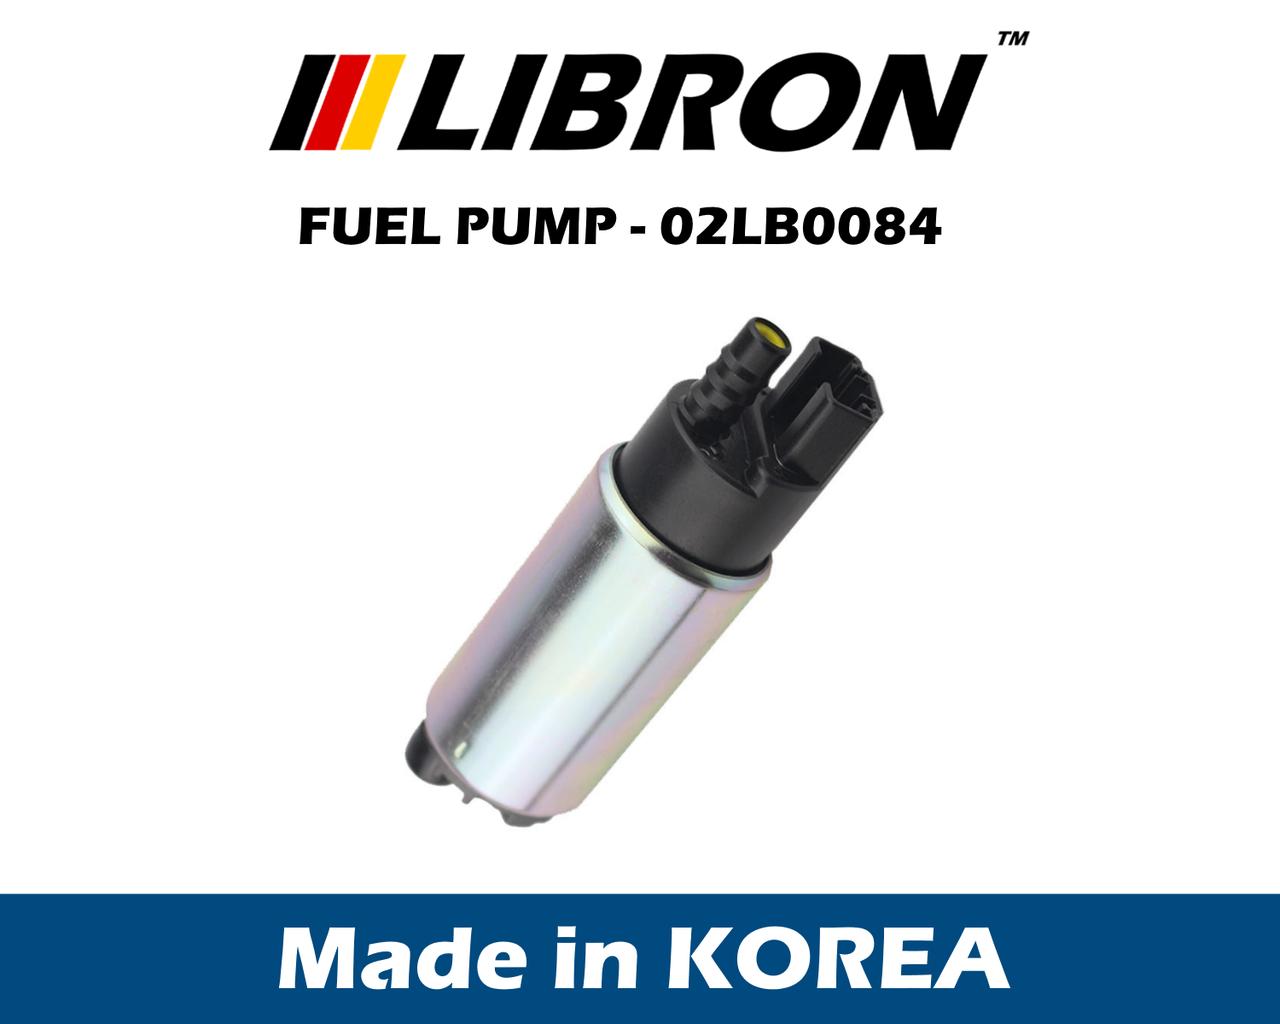 Бензонасос LIBRON 02LB0084 - Мазда 323 S IV